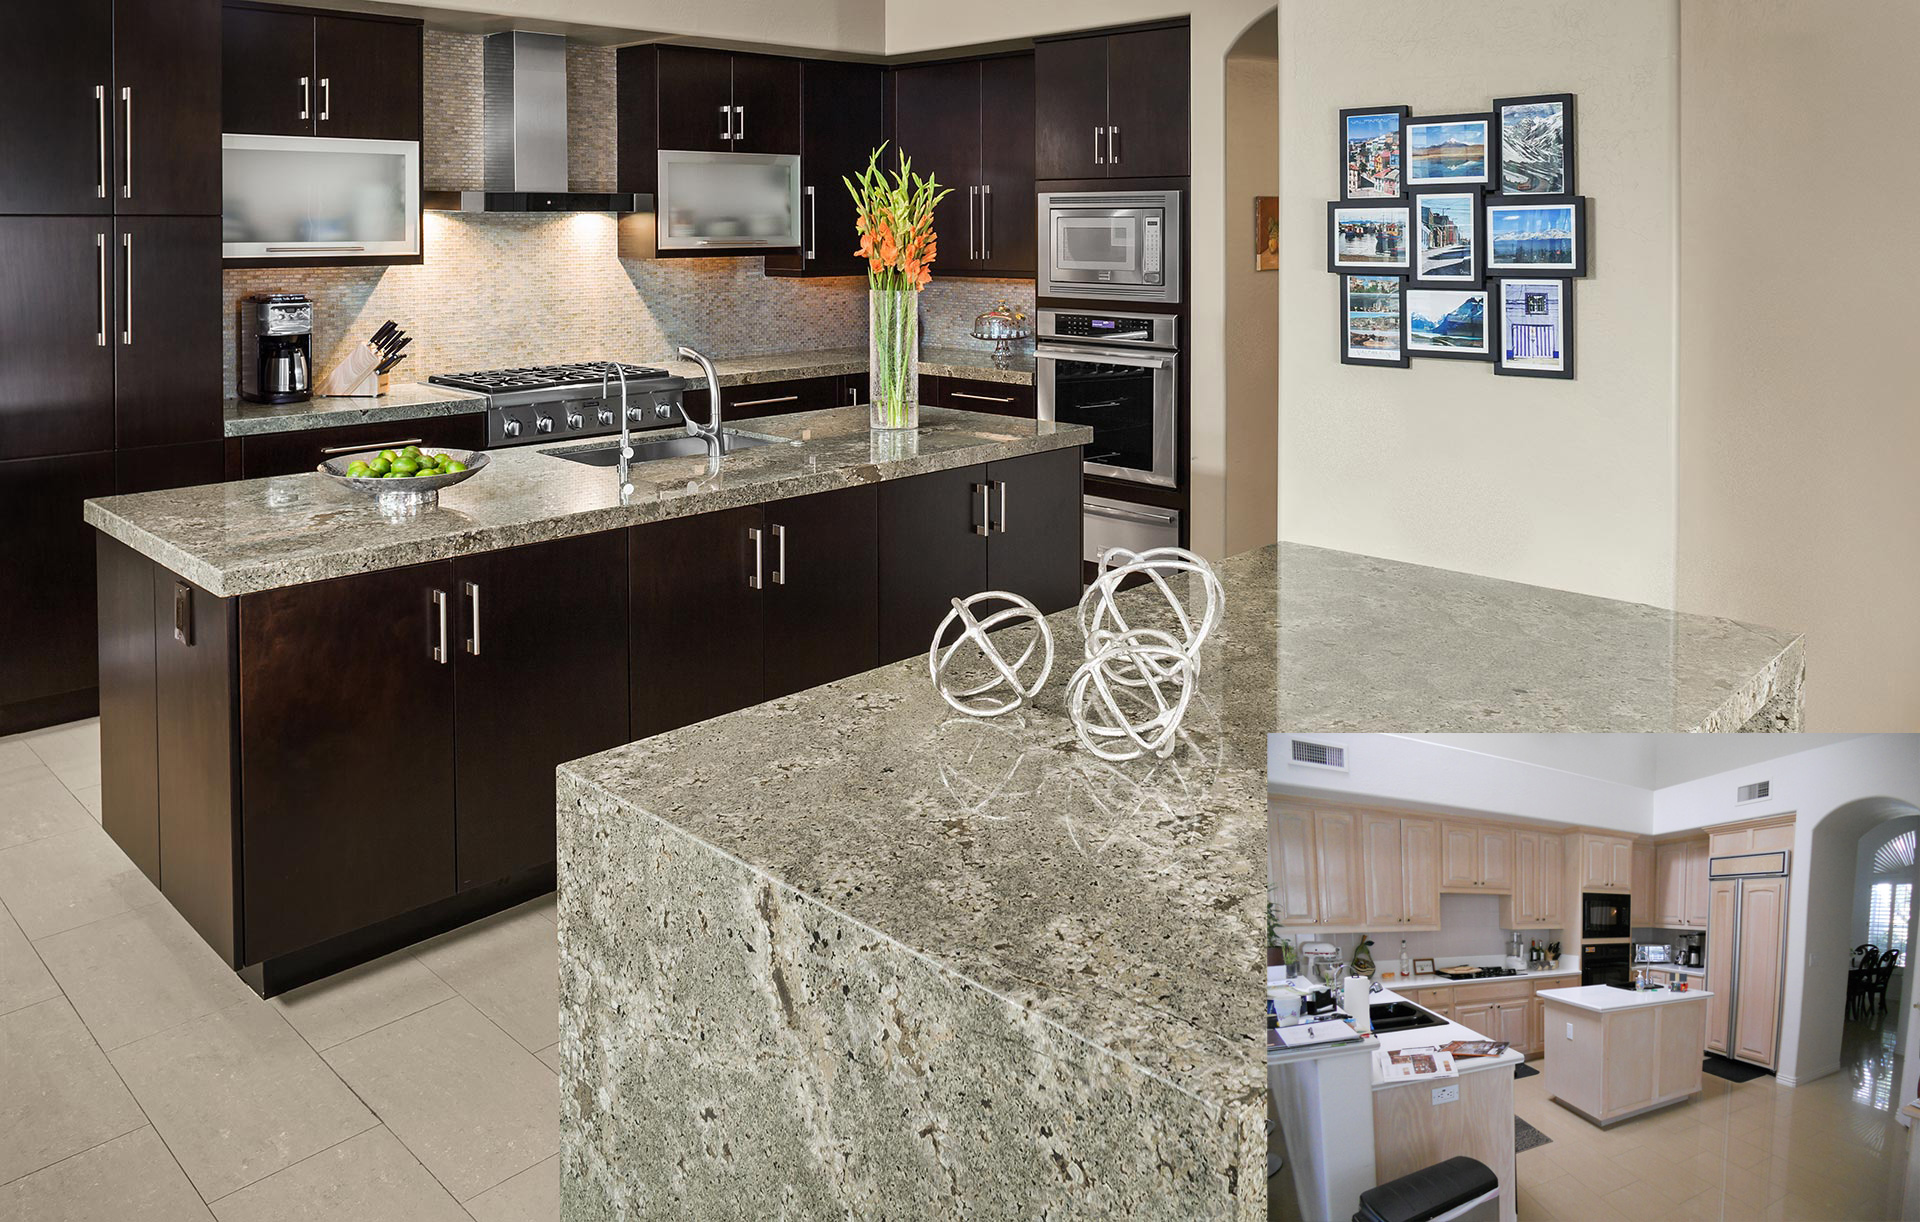 Mission-Kitchen-before-after.jpg